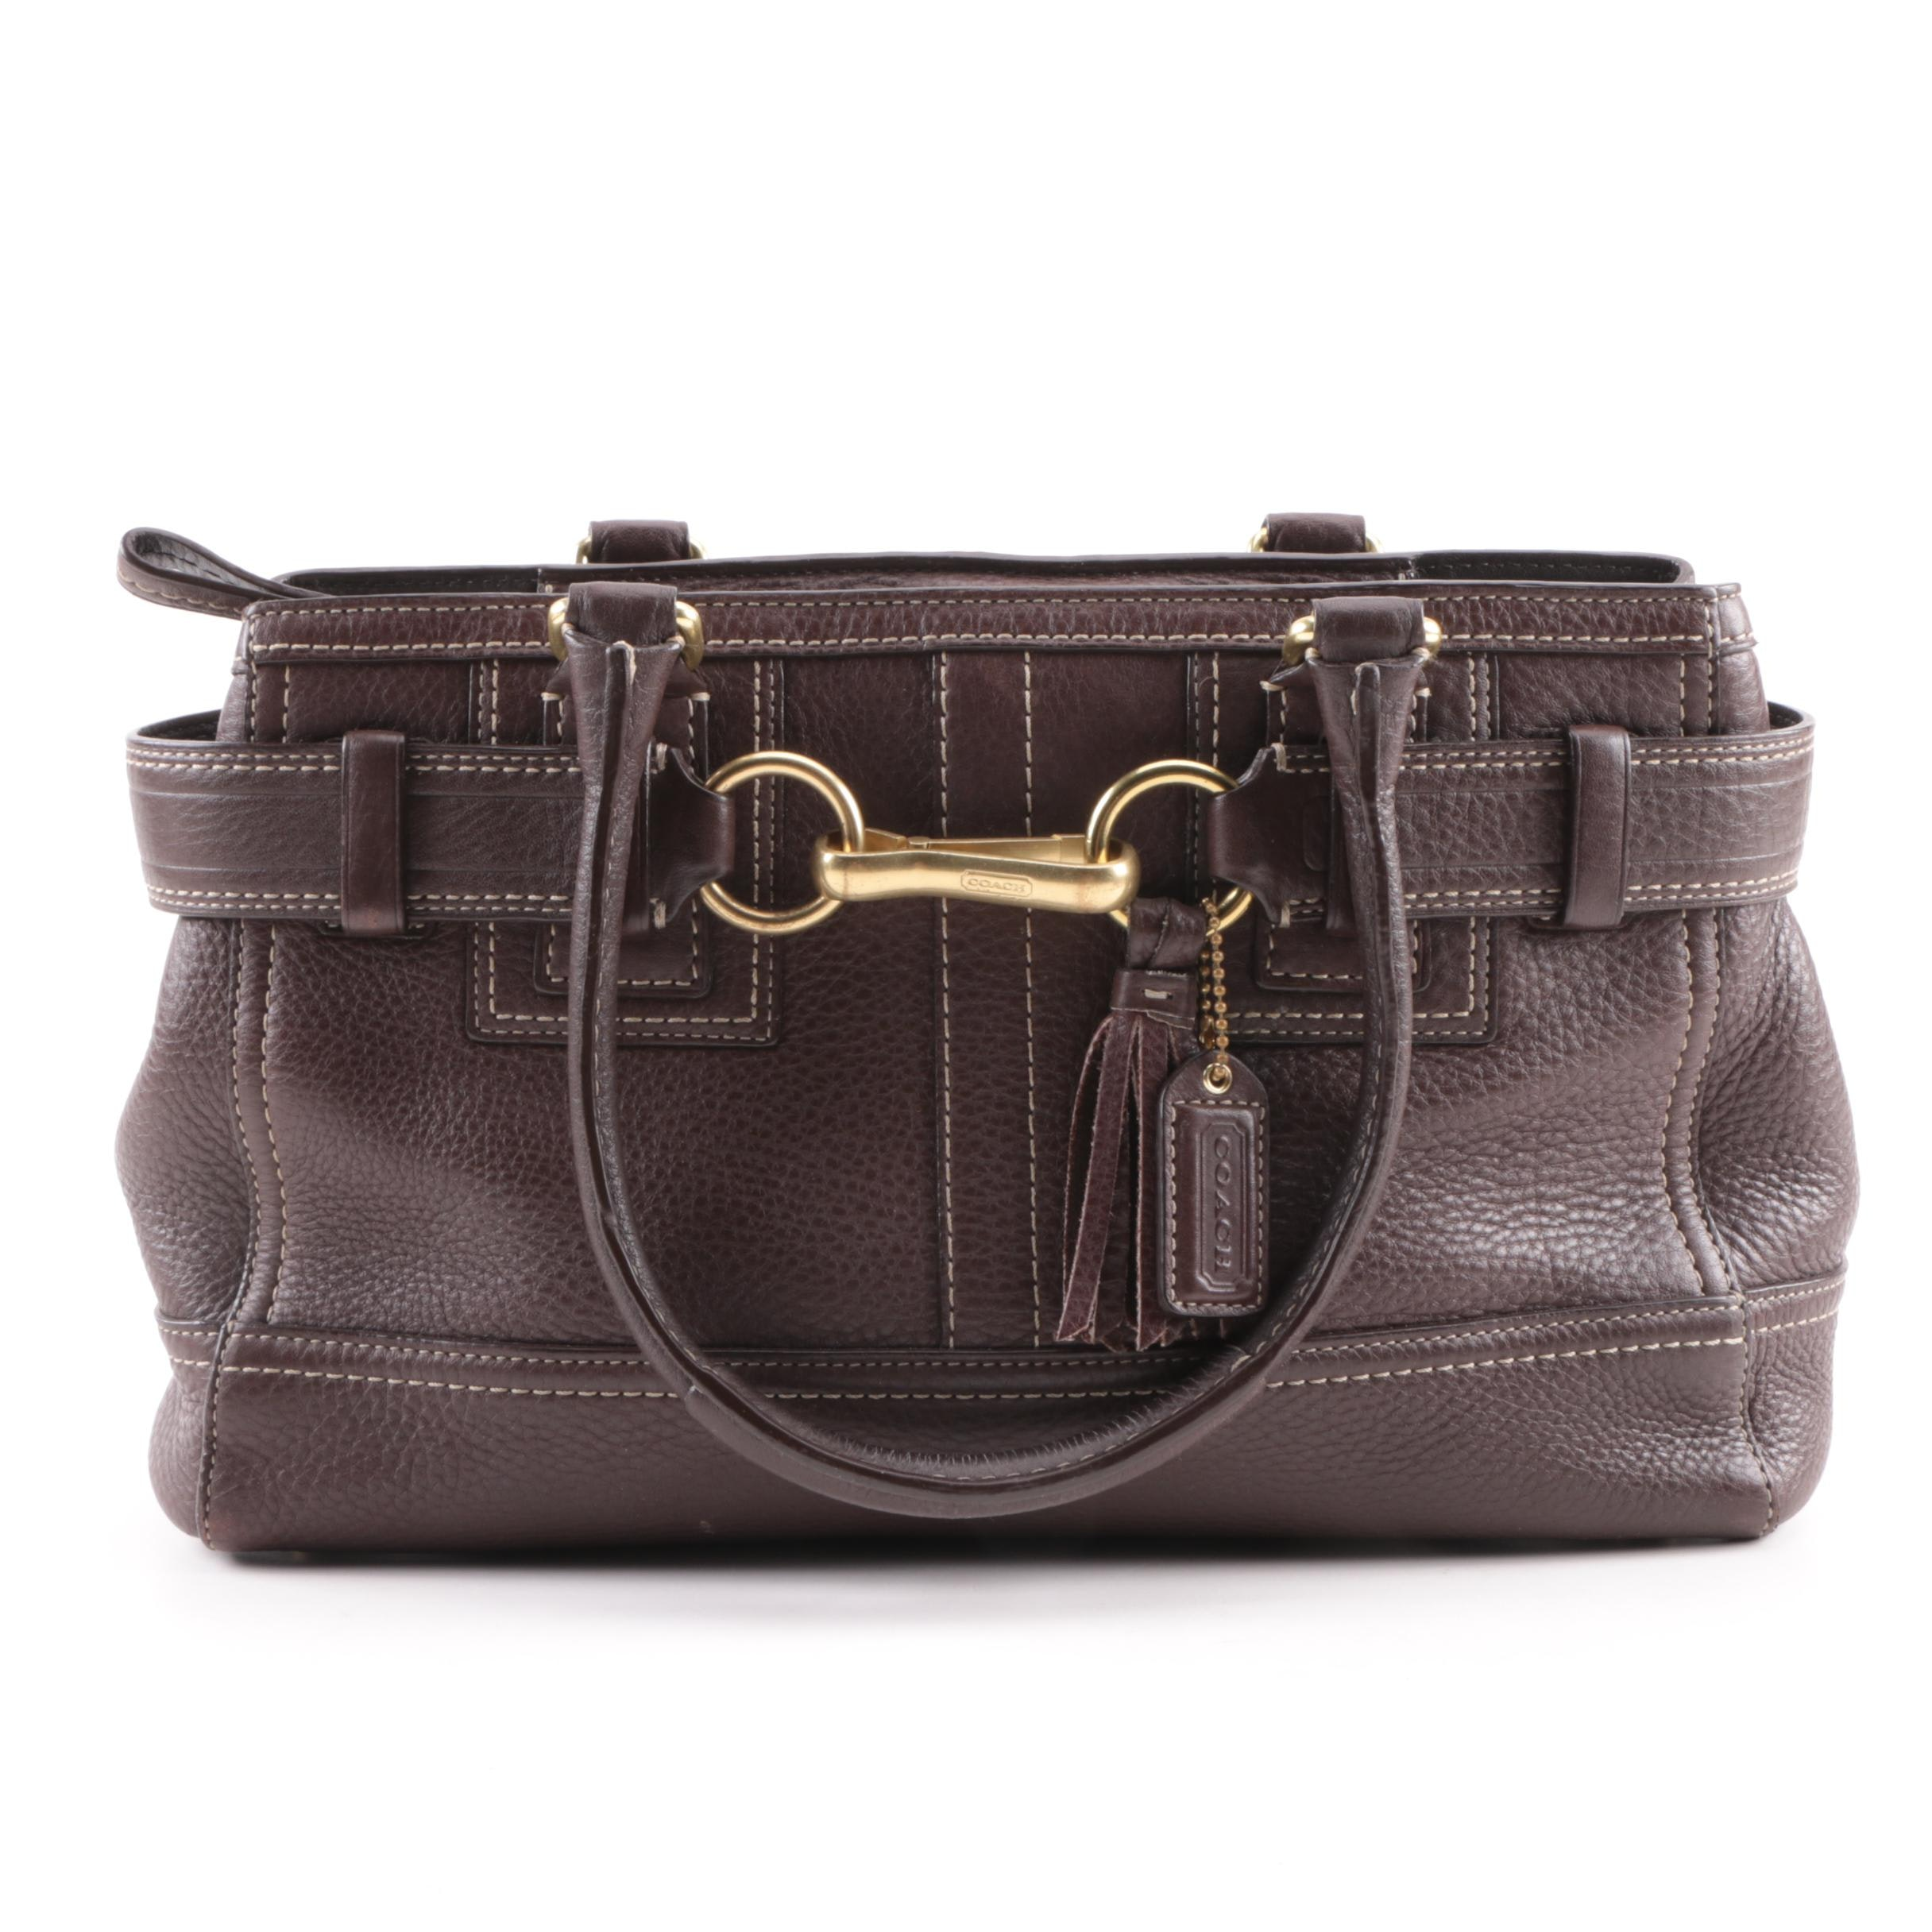 Coach Hamptons Dark Brown Pebbled Leather Shoulder Bag